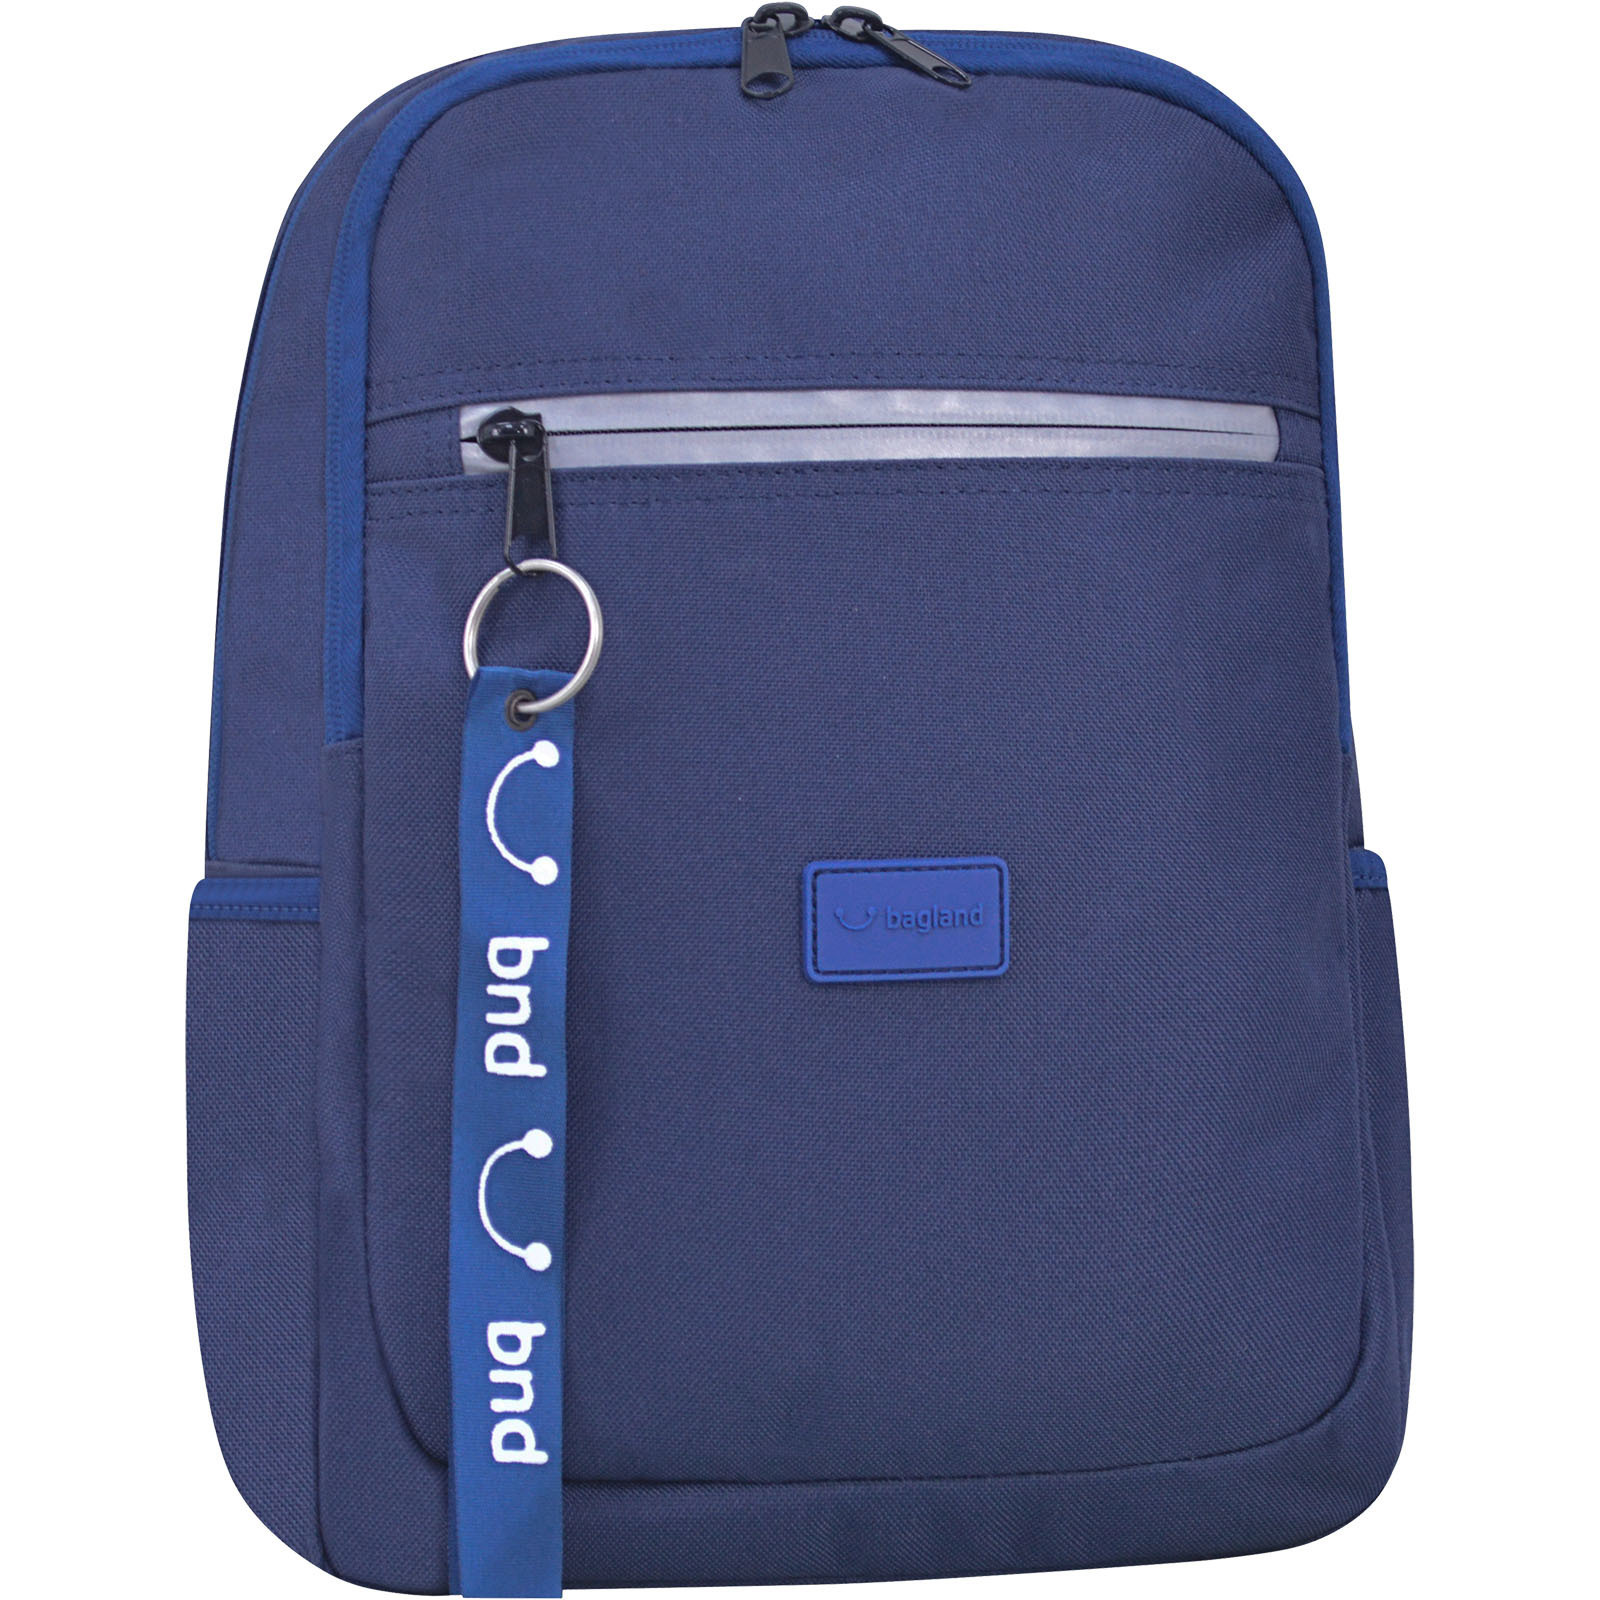 Молодежные рюкзаки Рюкзак Bagland Young 13 л. синий (0051066) DSC_1095-1600.jpg